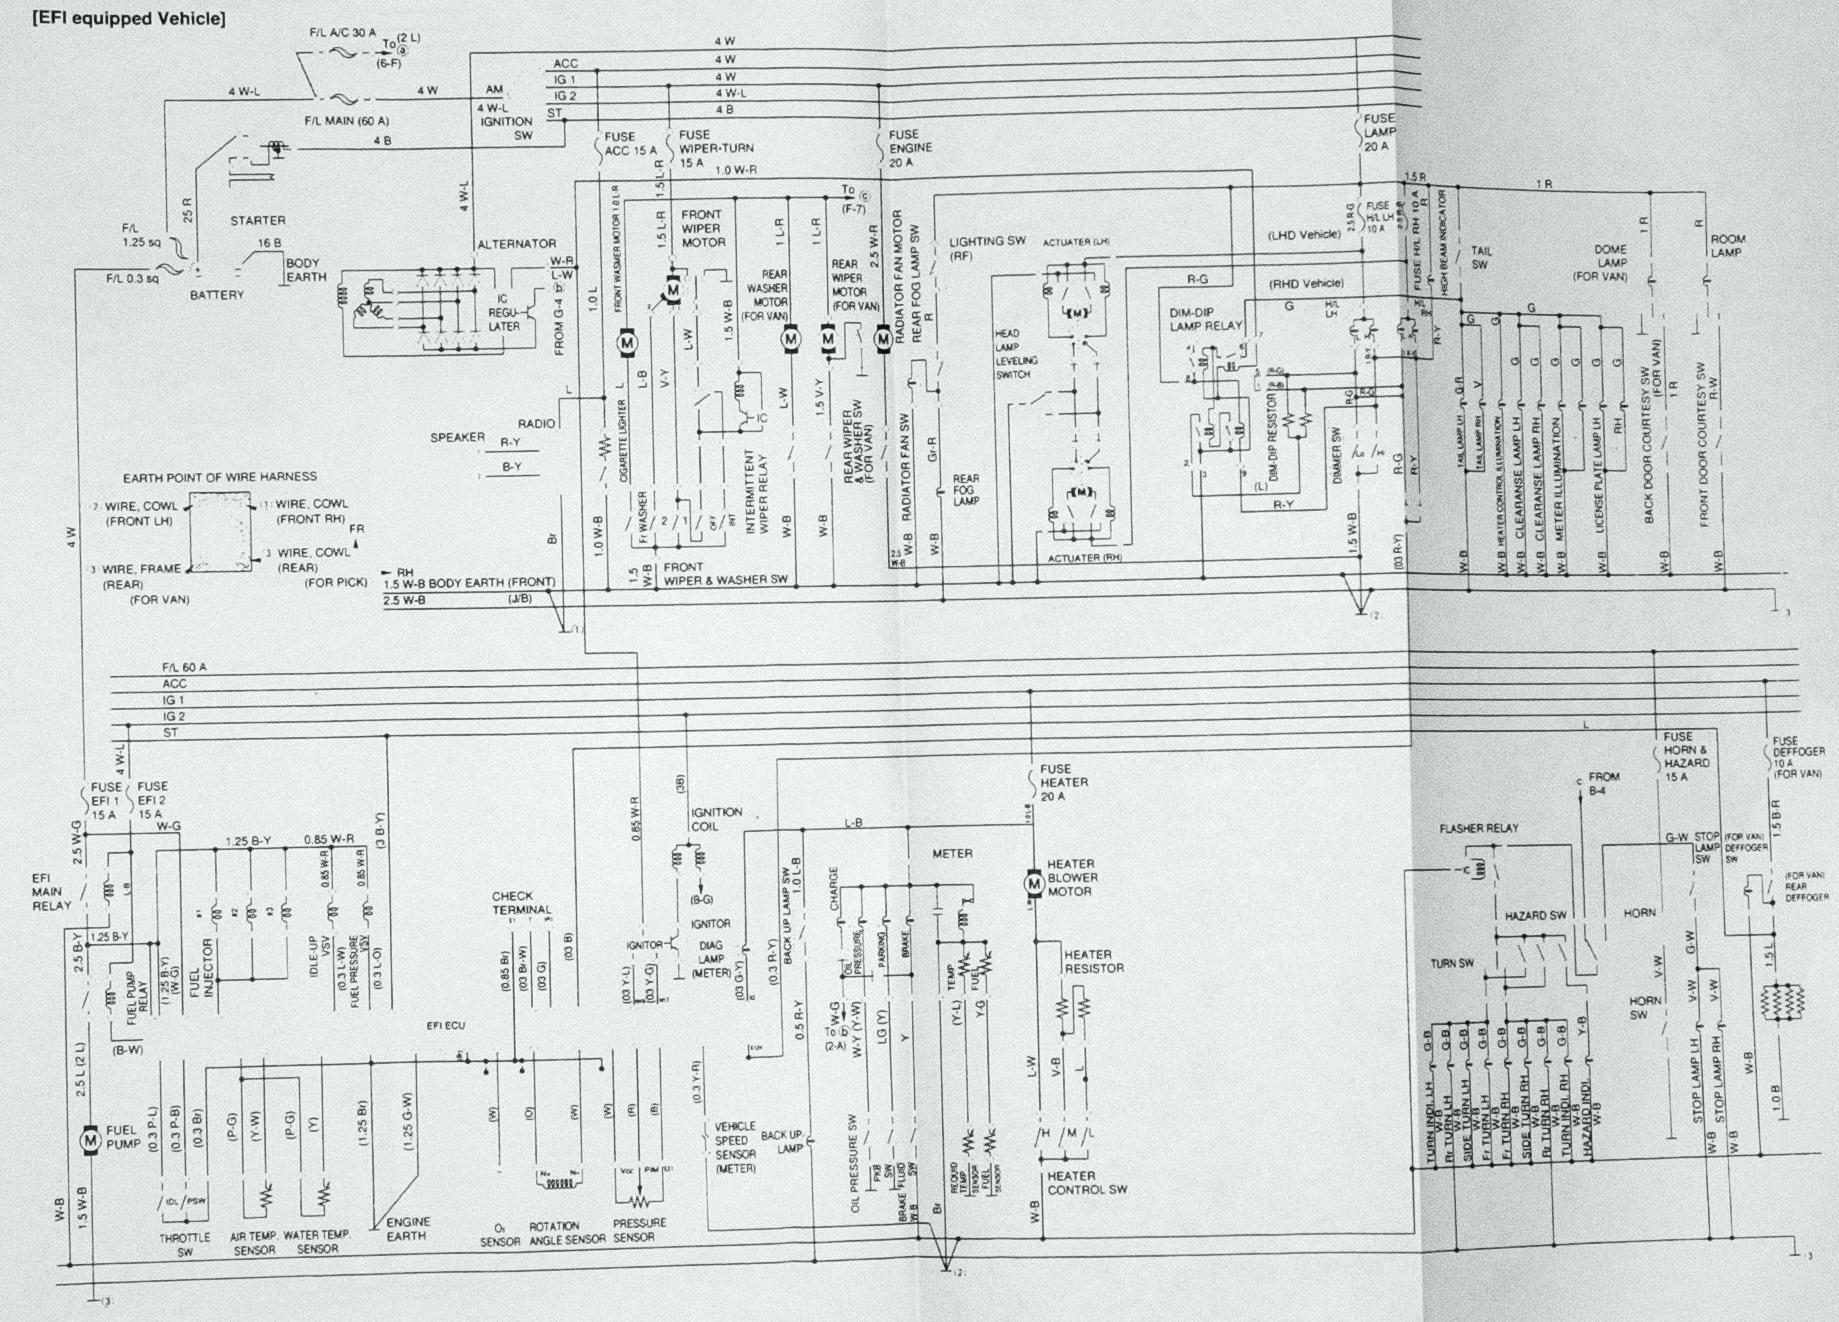 daihatsu vacuum diagram daihatsu hijet engine compartment diagram wiring library  daihatsu hijet engine compartment